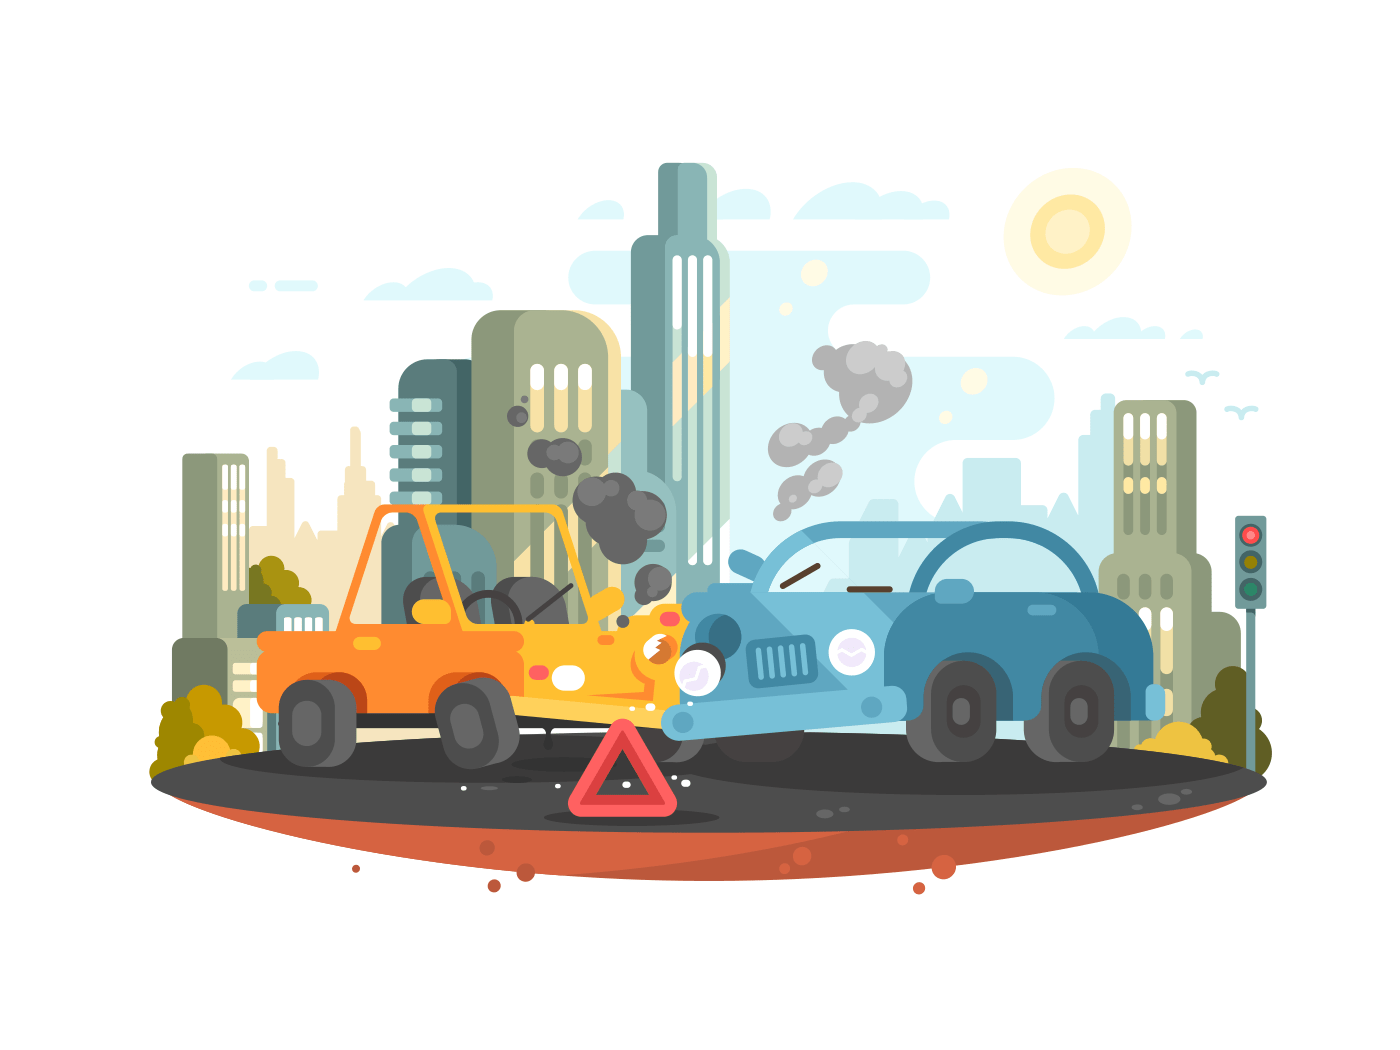 Road traffic accident illustration